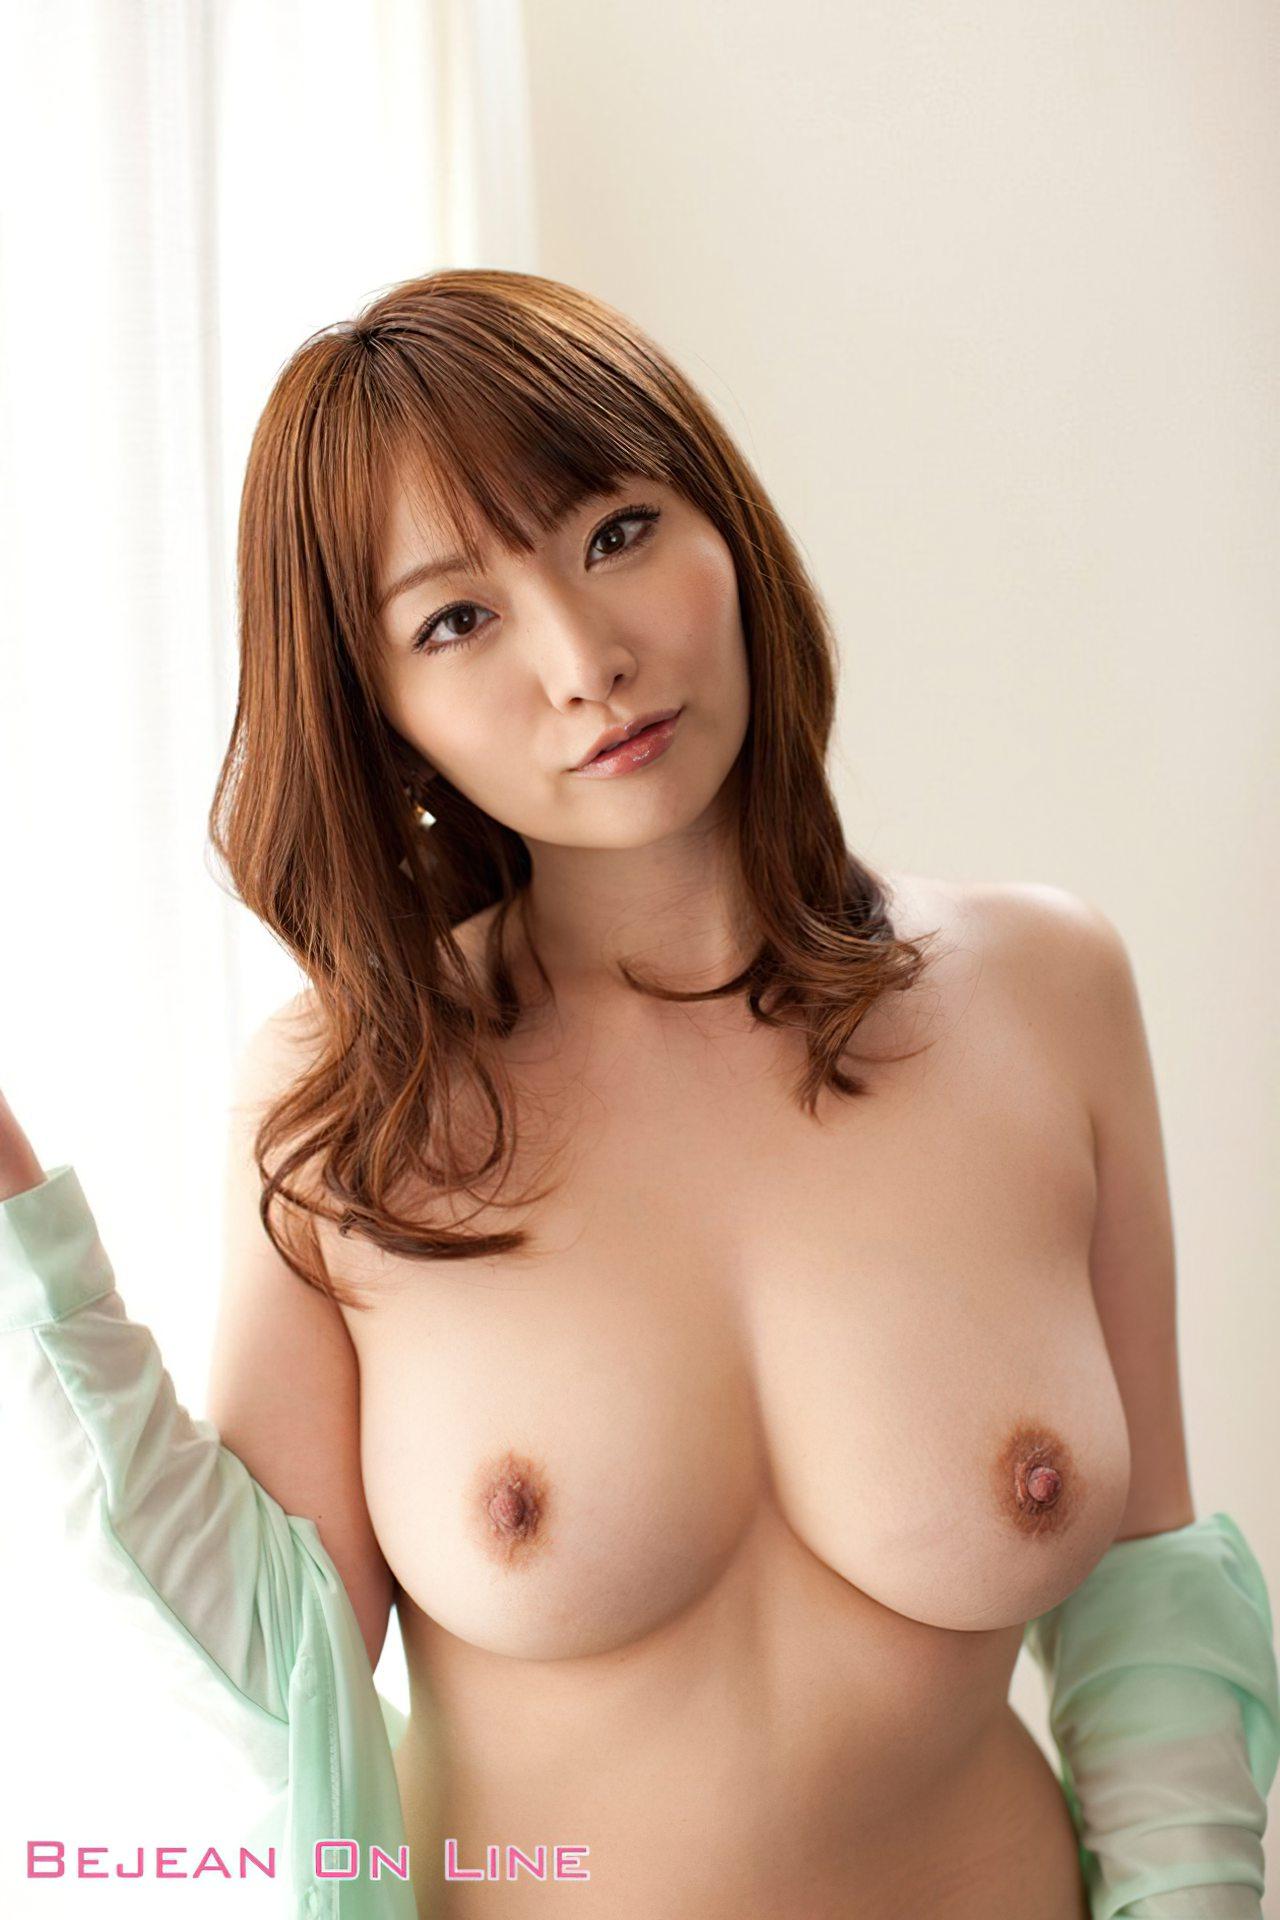 Japonesa Safada (7)